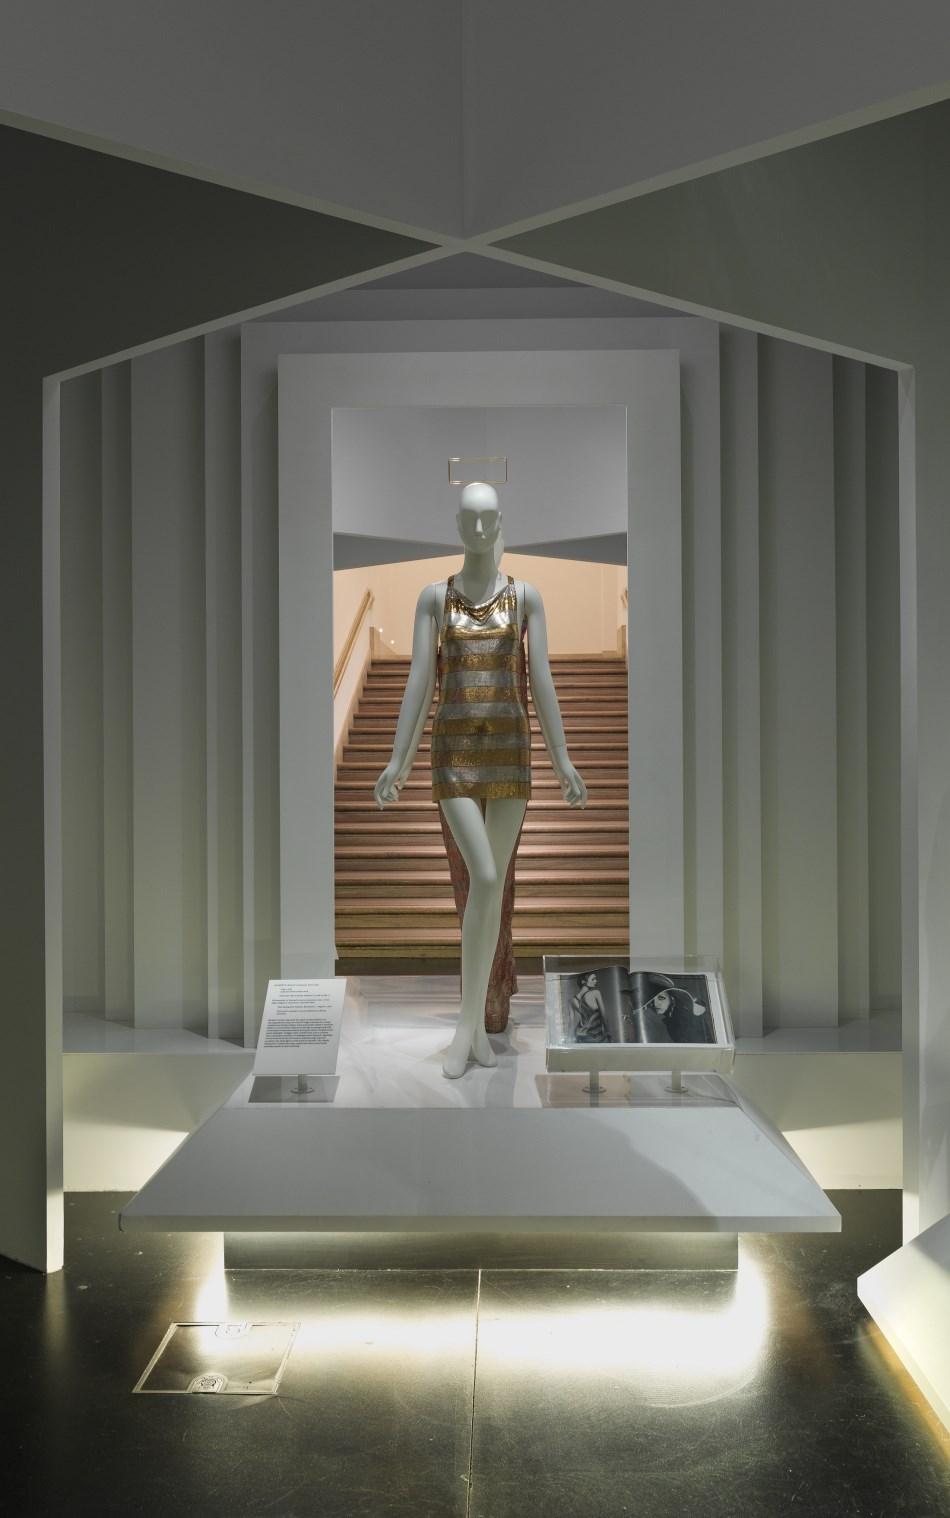 Image courtesy of  The Metropolitan Museum of Art